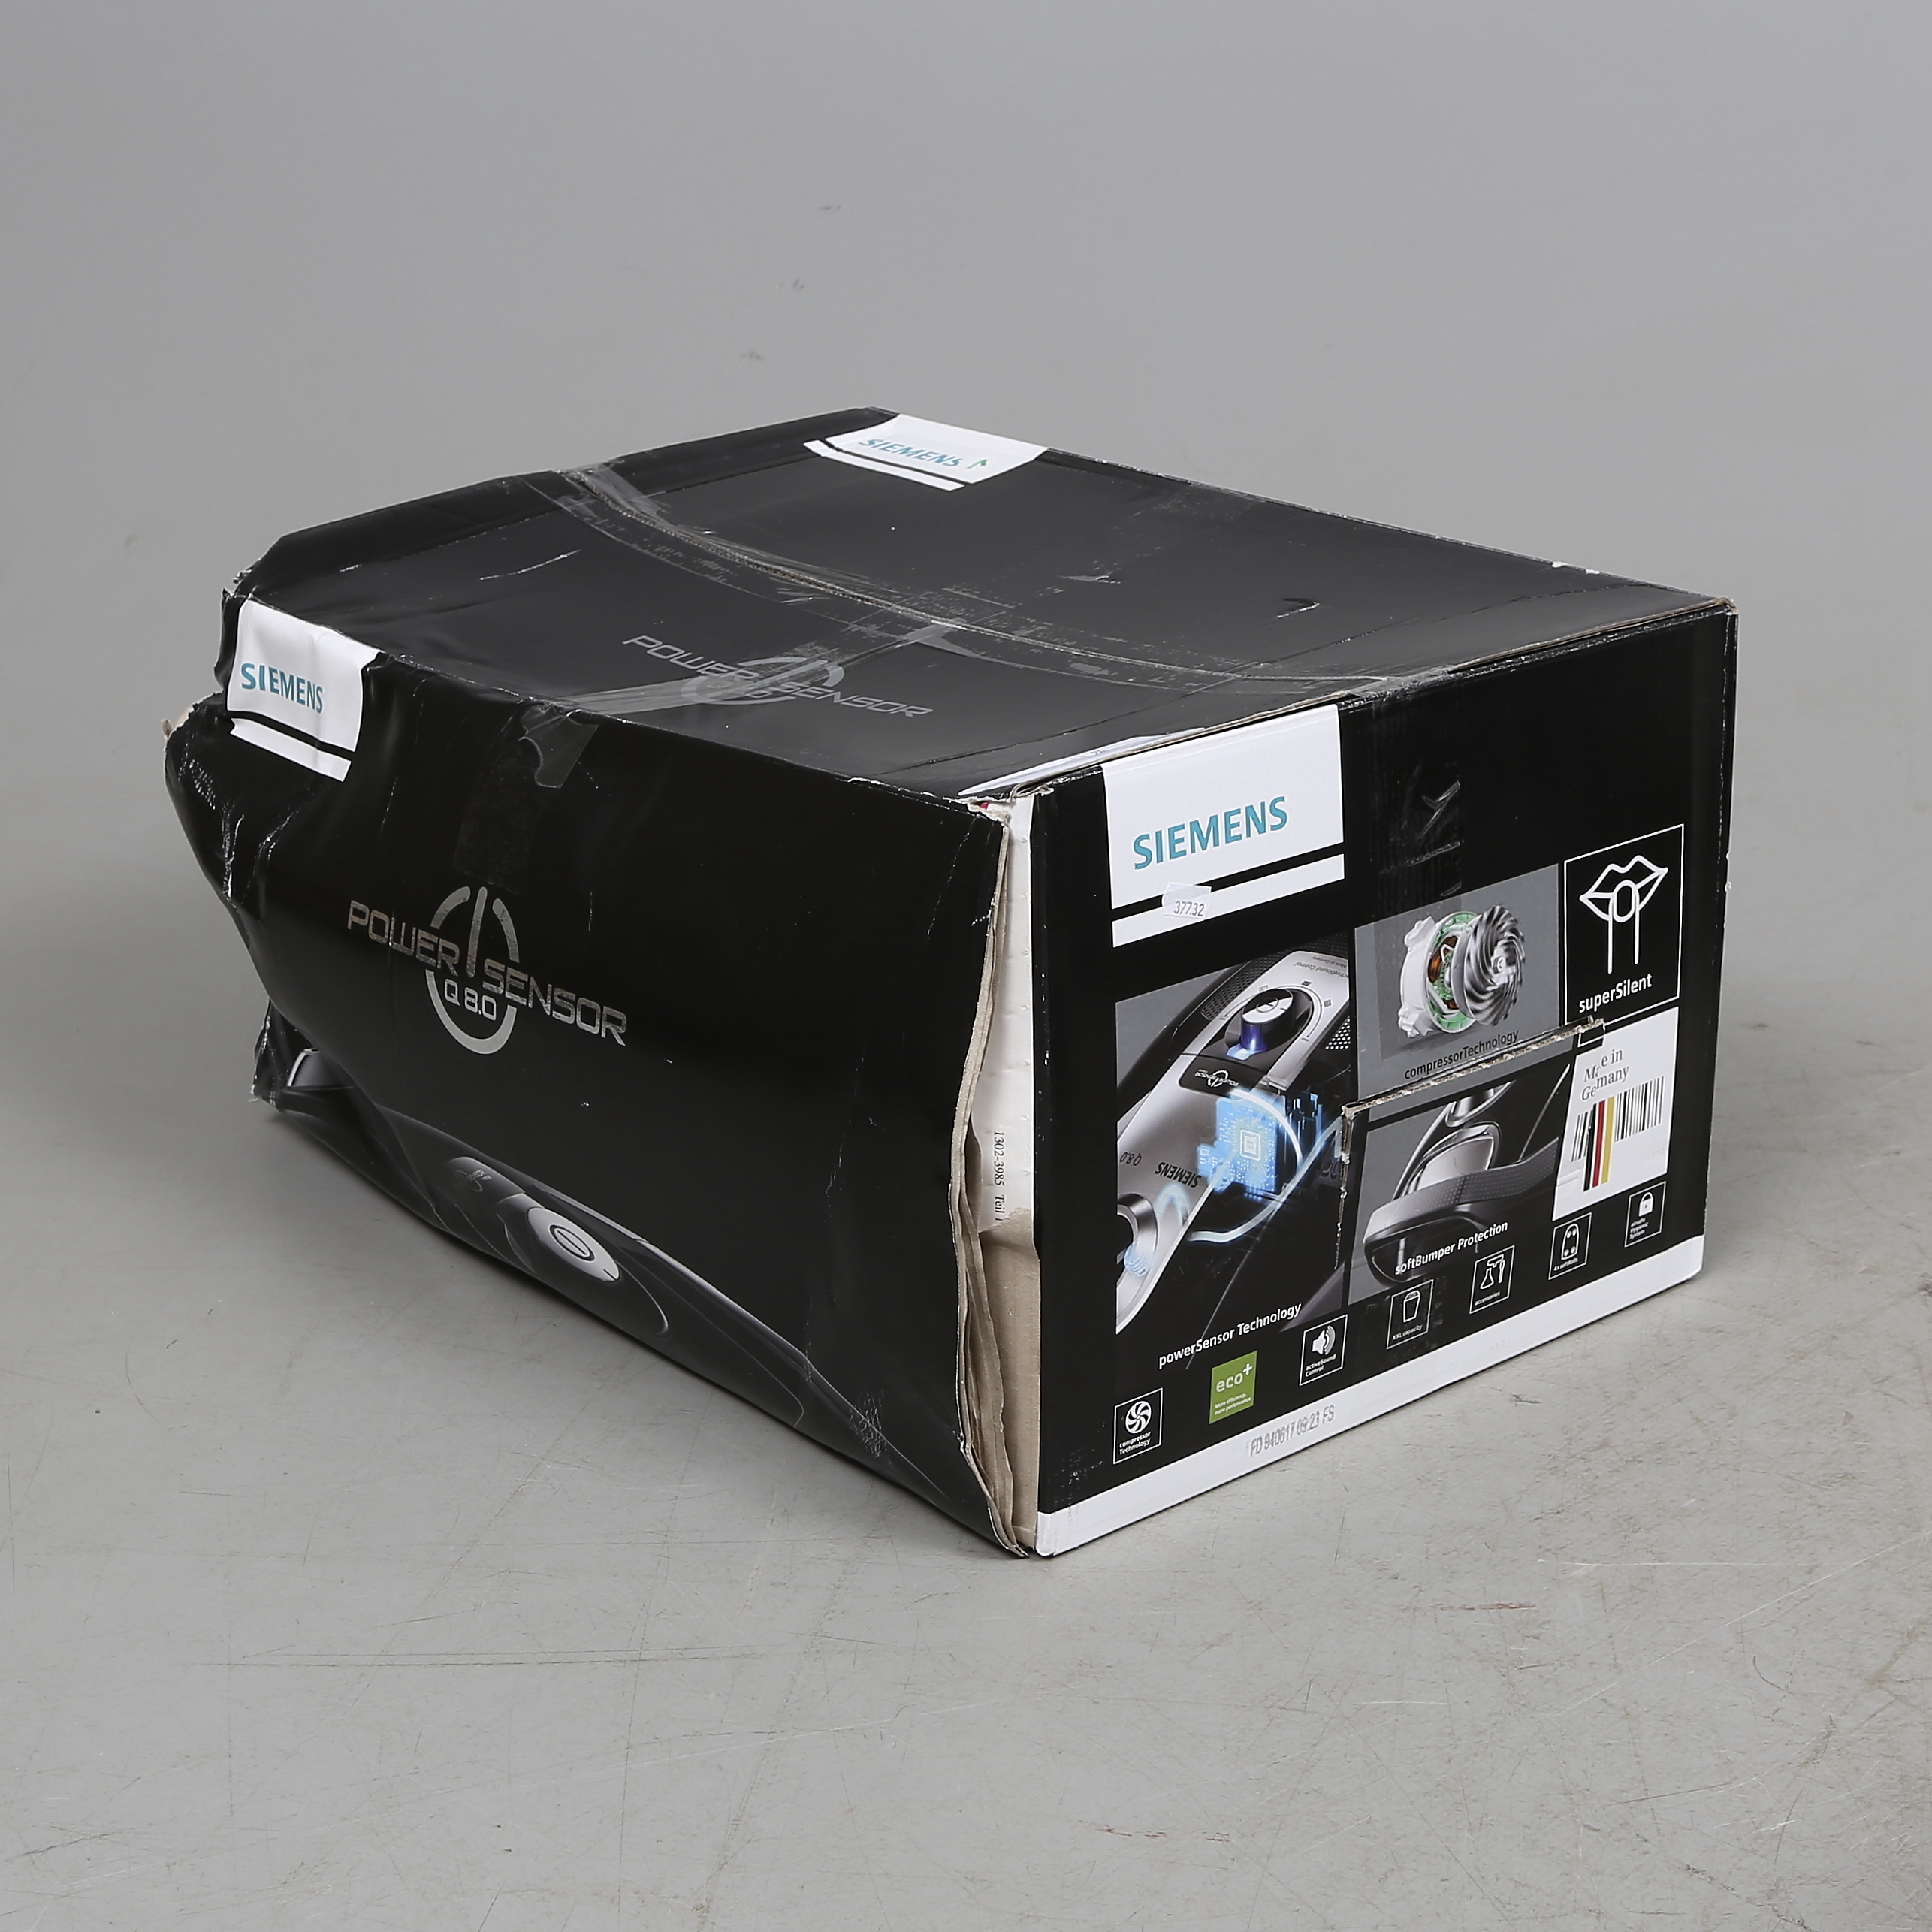 DAMMERUGARE, Siemens, Power Sensor Q 8.0. Other Modern